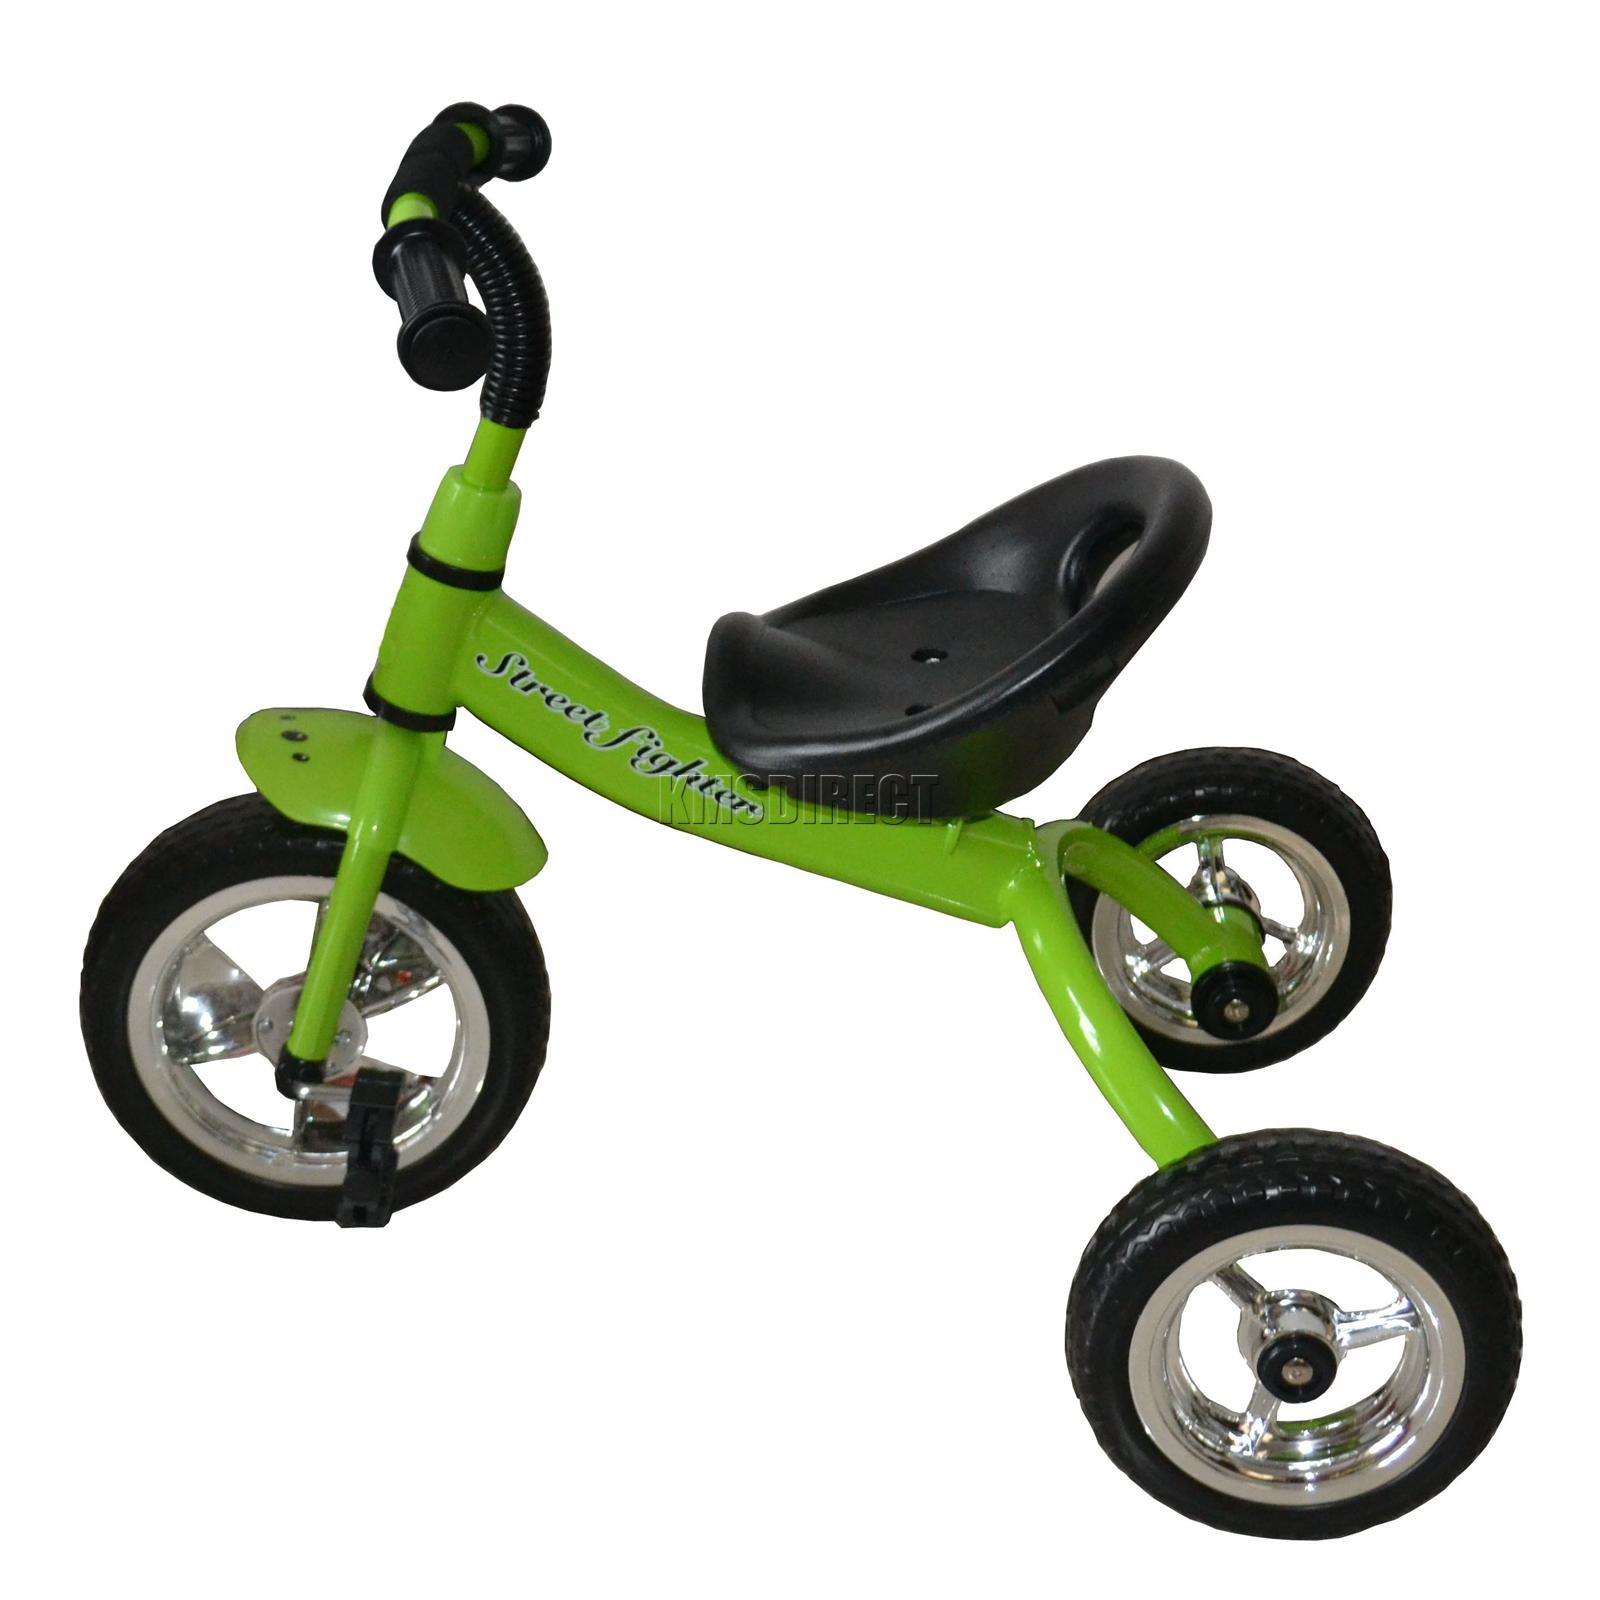 foxhunter green kids child children trike tricycle 3 wheel. Black Bedroom Furniture Sets. Home Design Ideas